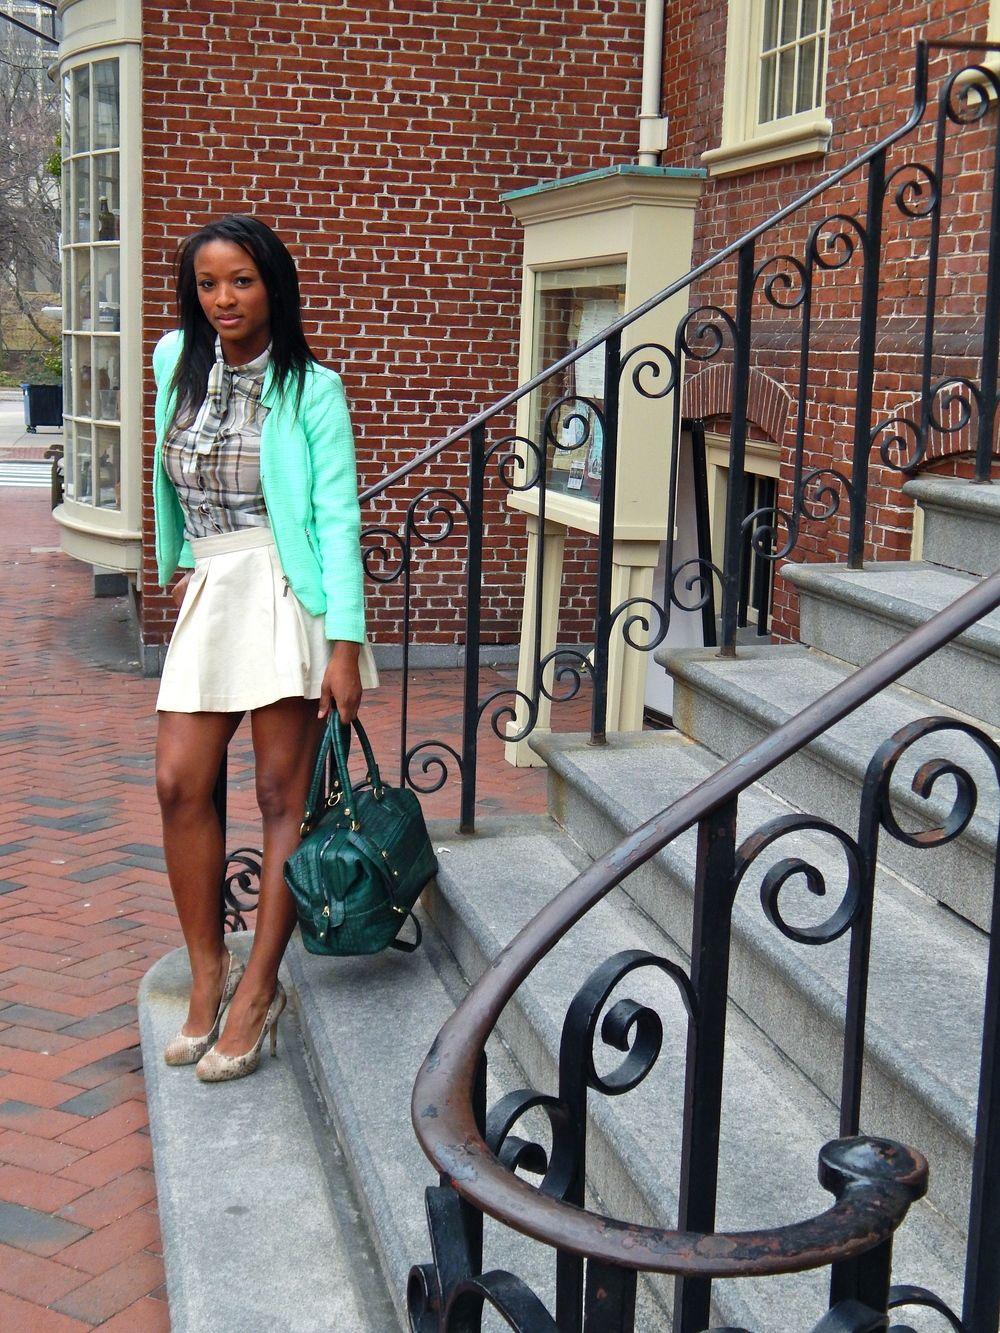 Blazer:Mandee,Shirt:Charlotte Russe, Skirt:Forever 21, Shoes:I.N.C. via Macy's,Purse:T.J. Maxx